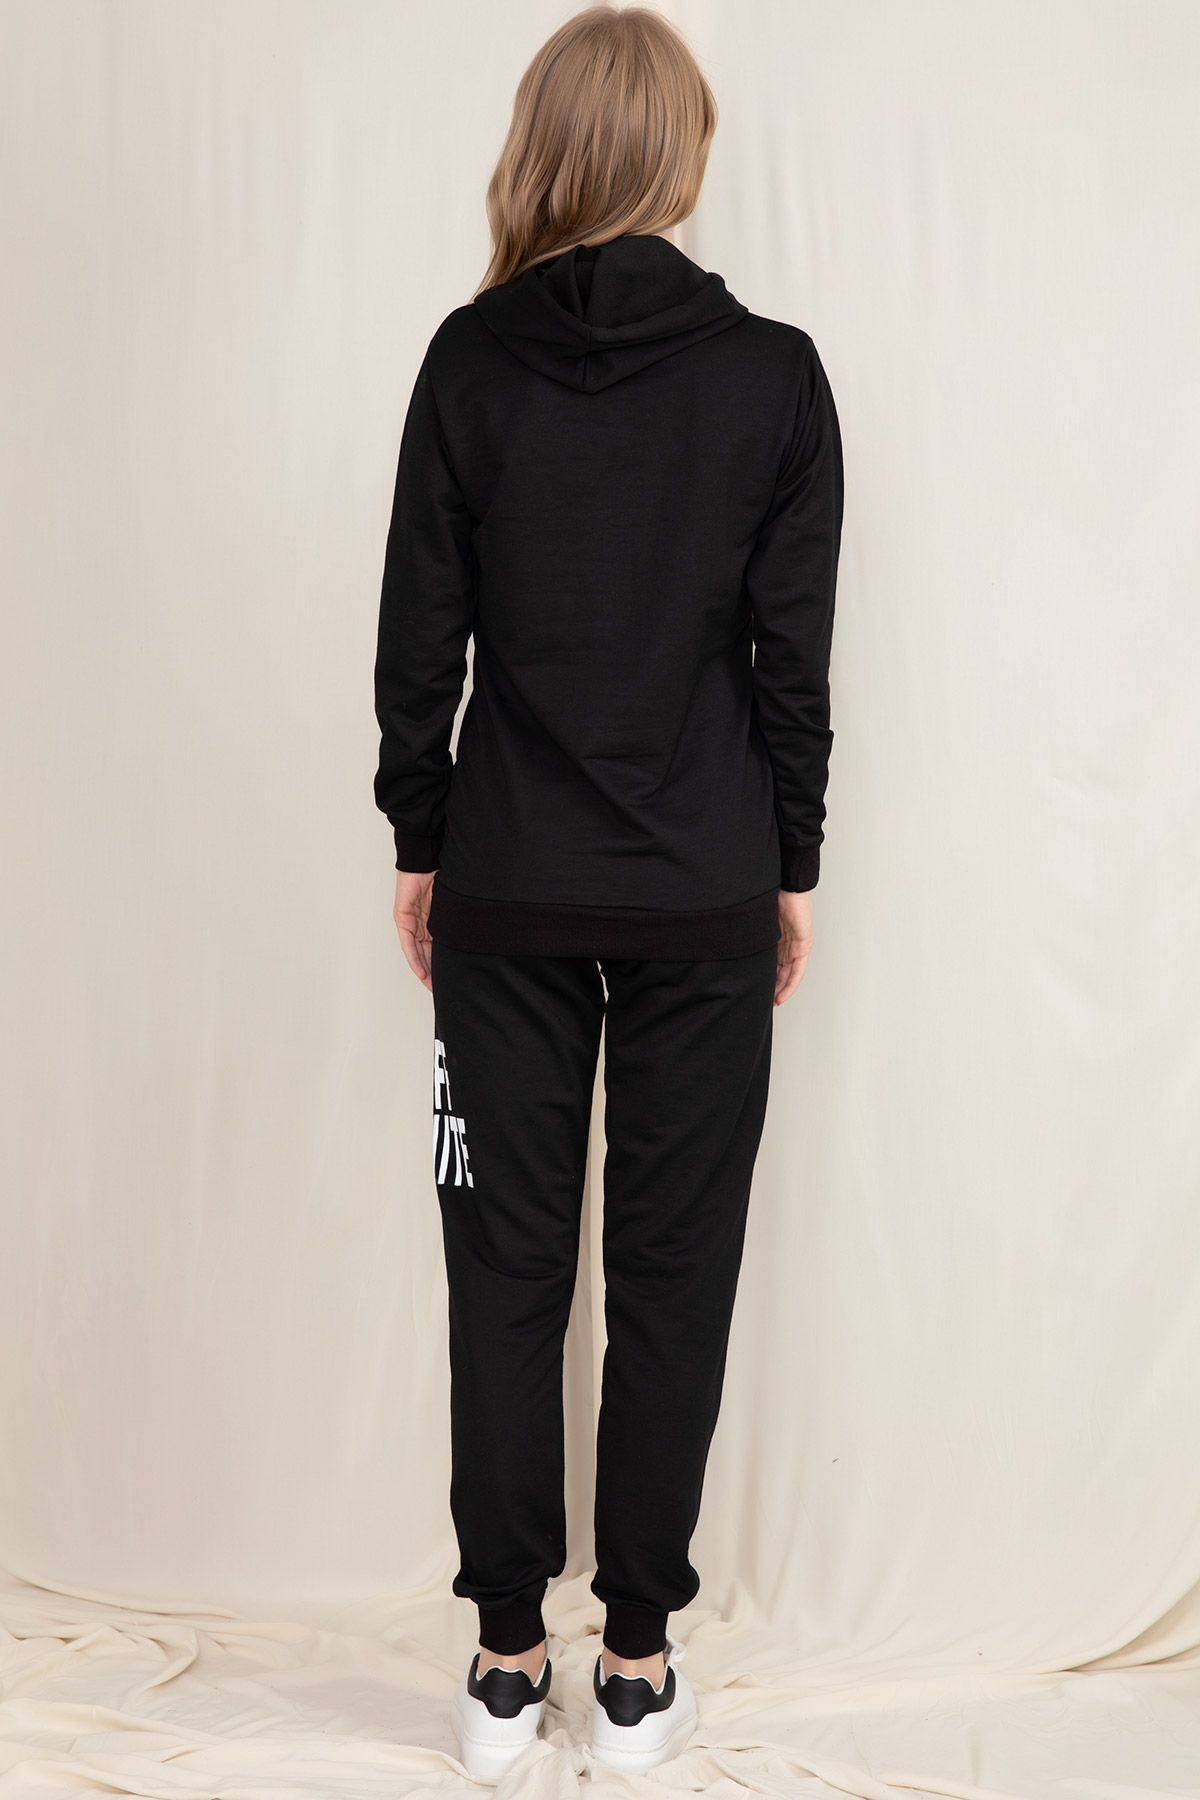 Sweat & Track Suit-Black